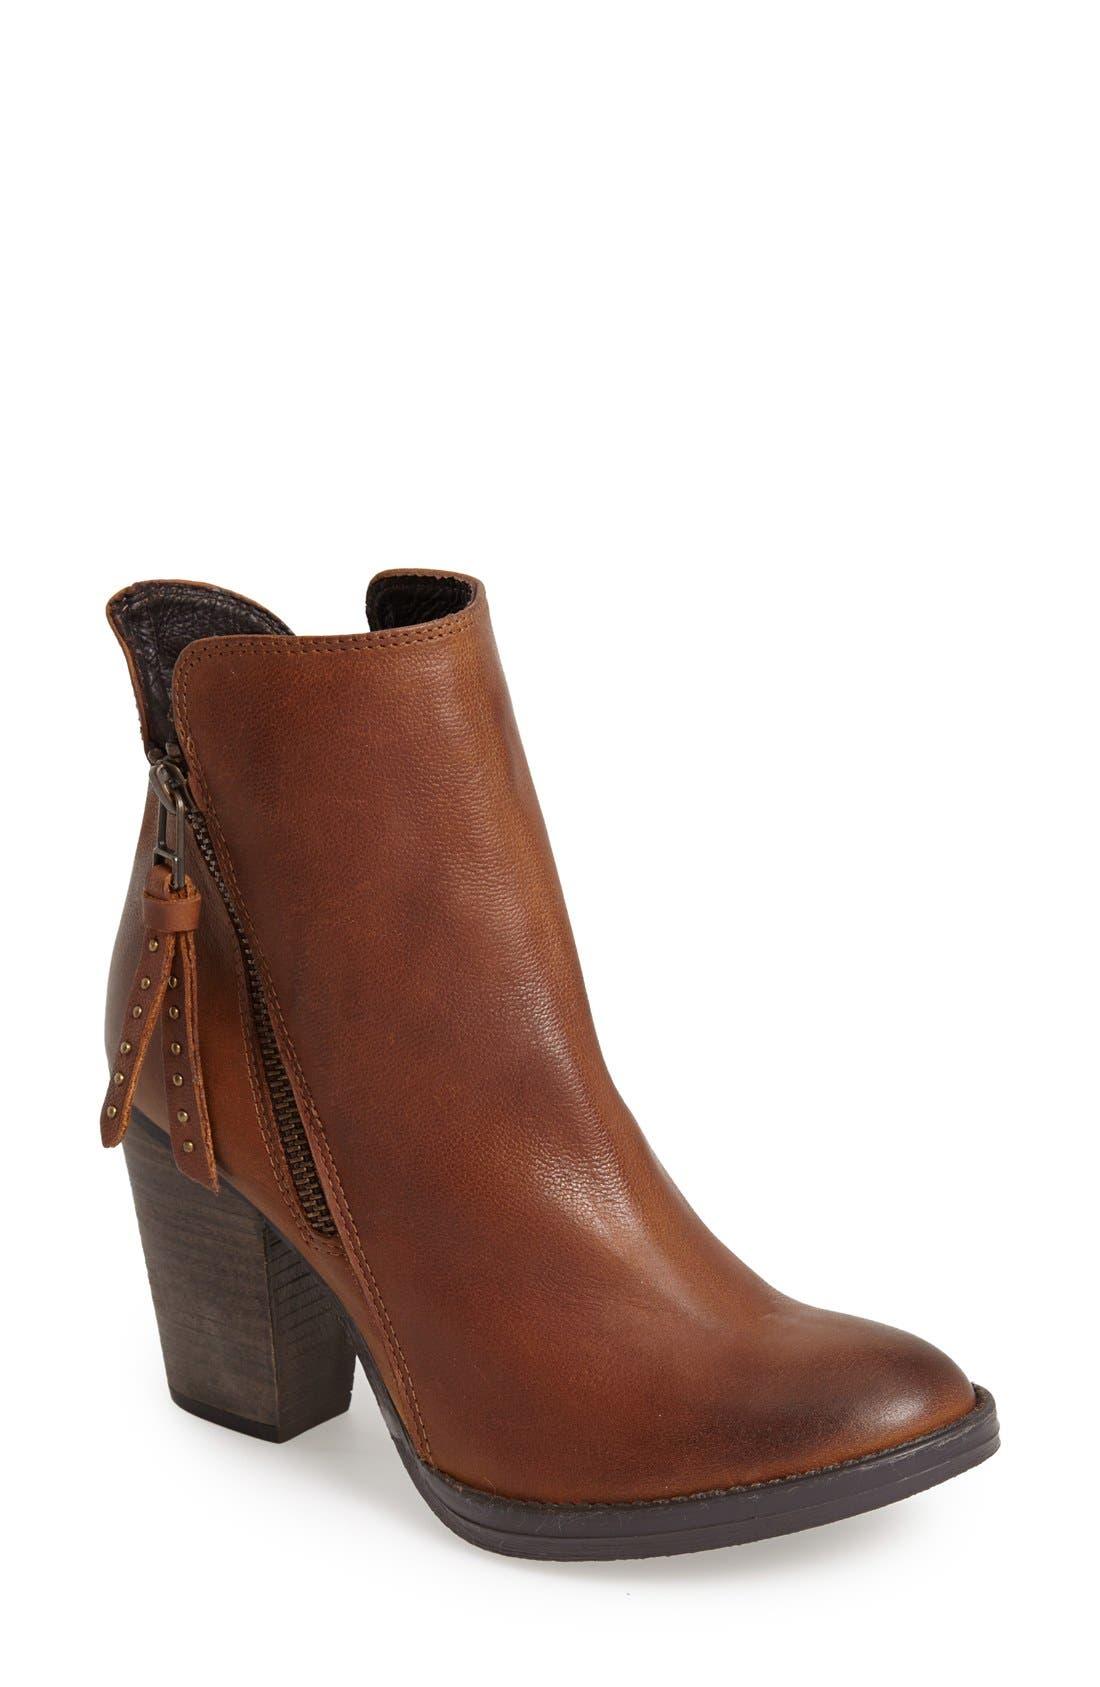 Alternate Image 1 Selected - Steve Madden 'Ryat' Leather Ankle Bootie (Women)